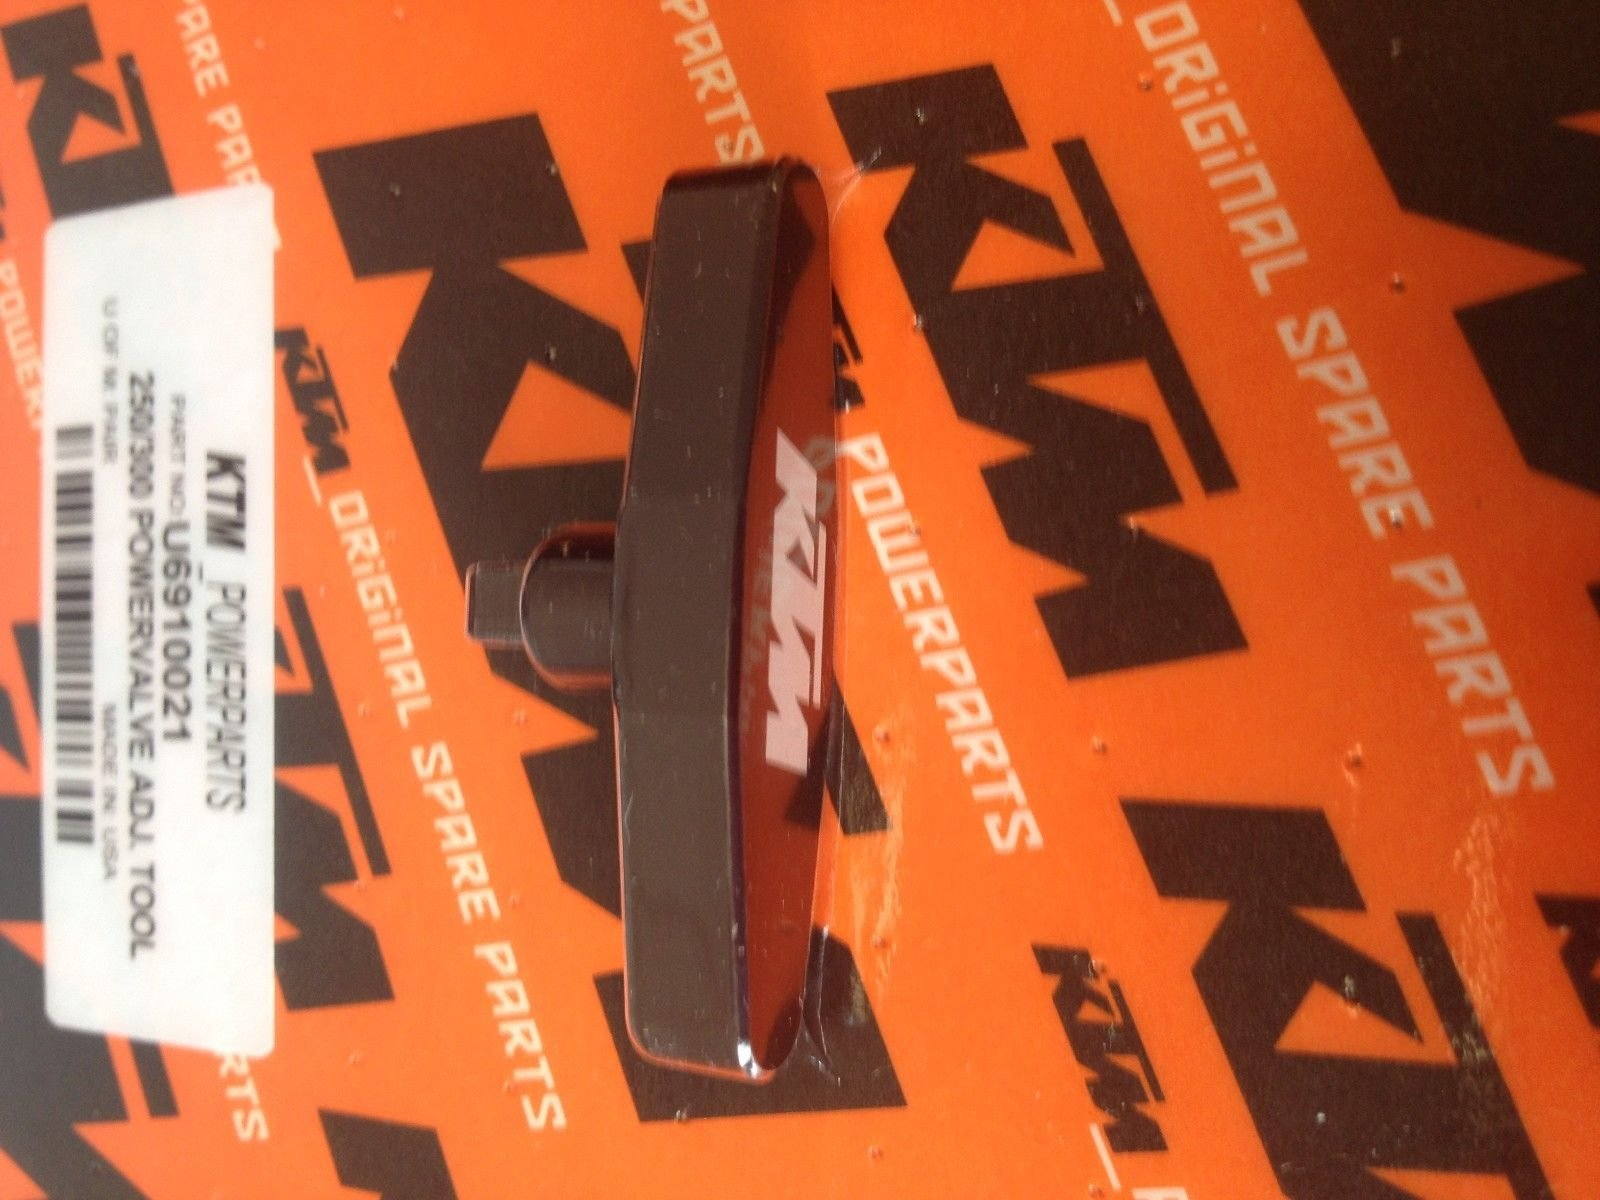 NEW KTM POWER VALVE ADJUSTMENT TOOL SX XC EXC 250 300 U6910021 by KTM